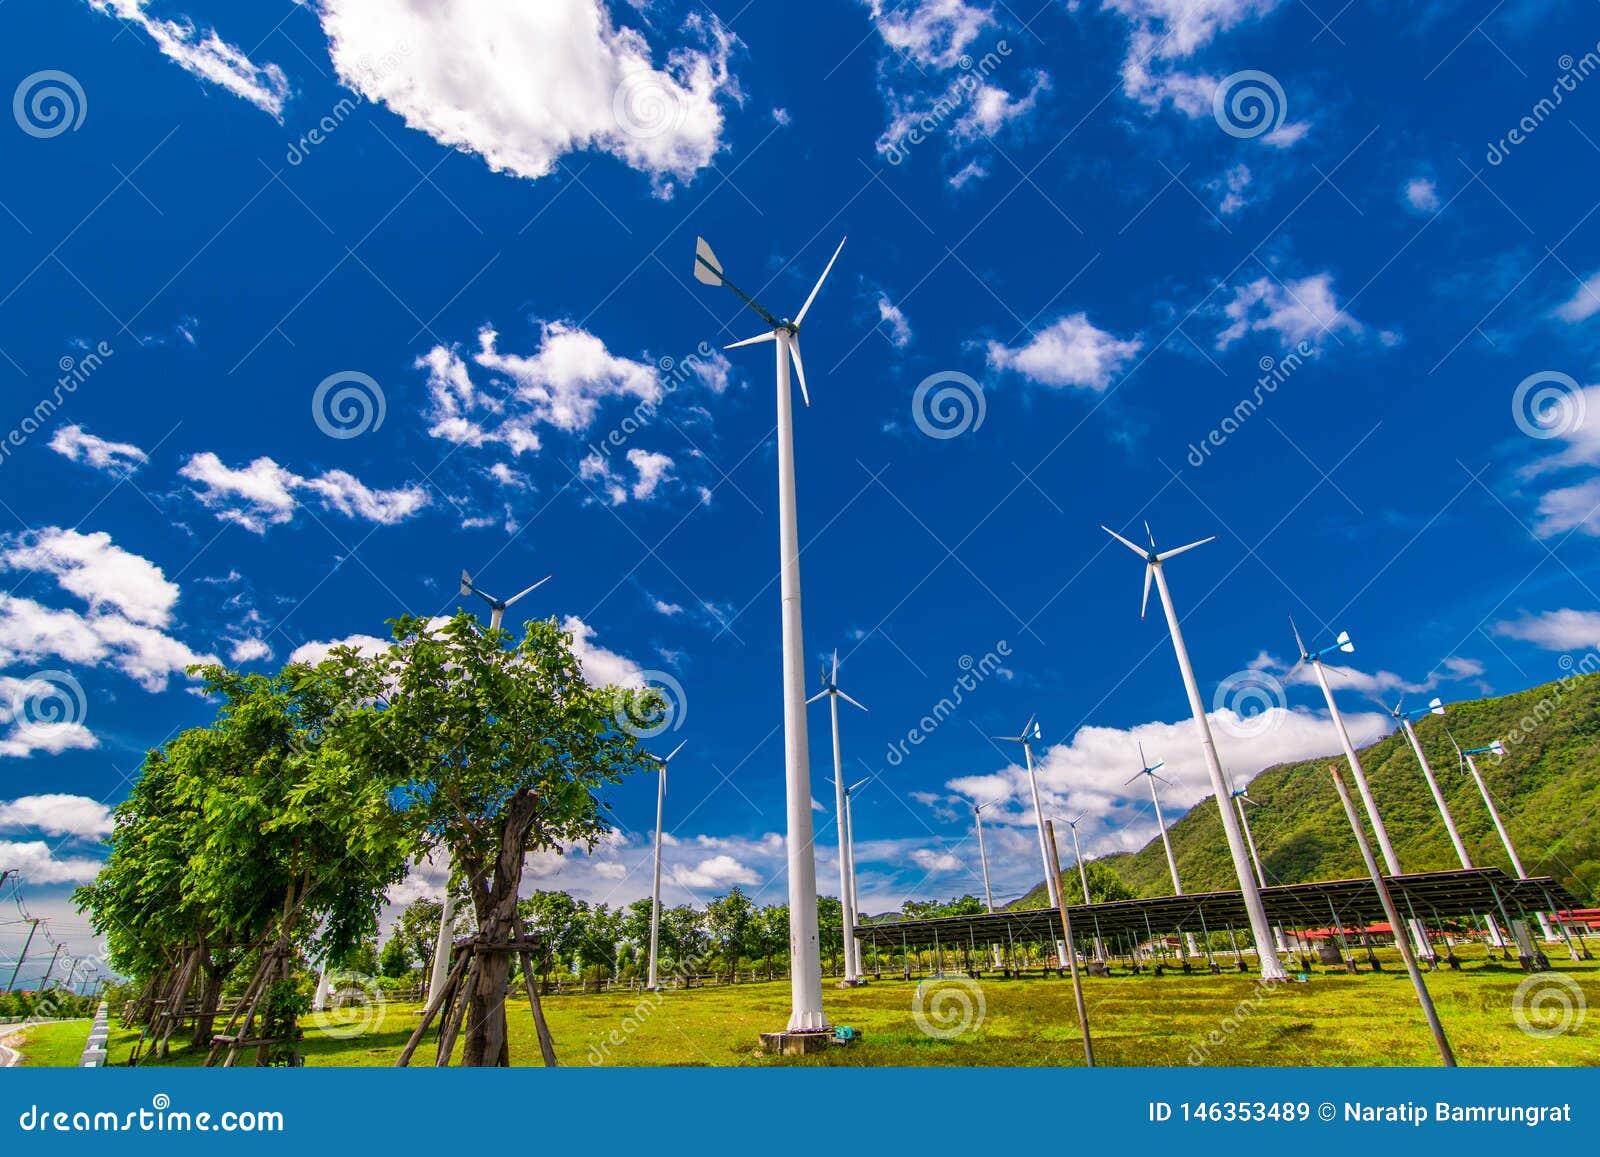 Windkraftanlagen, Solarenergie mitten in den Ebenen